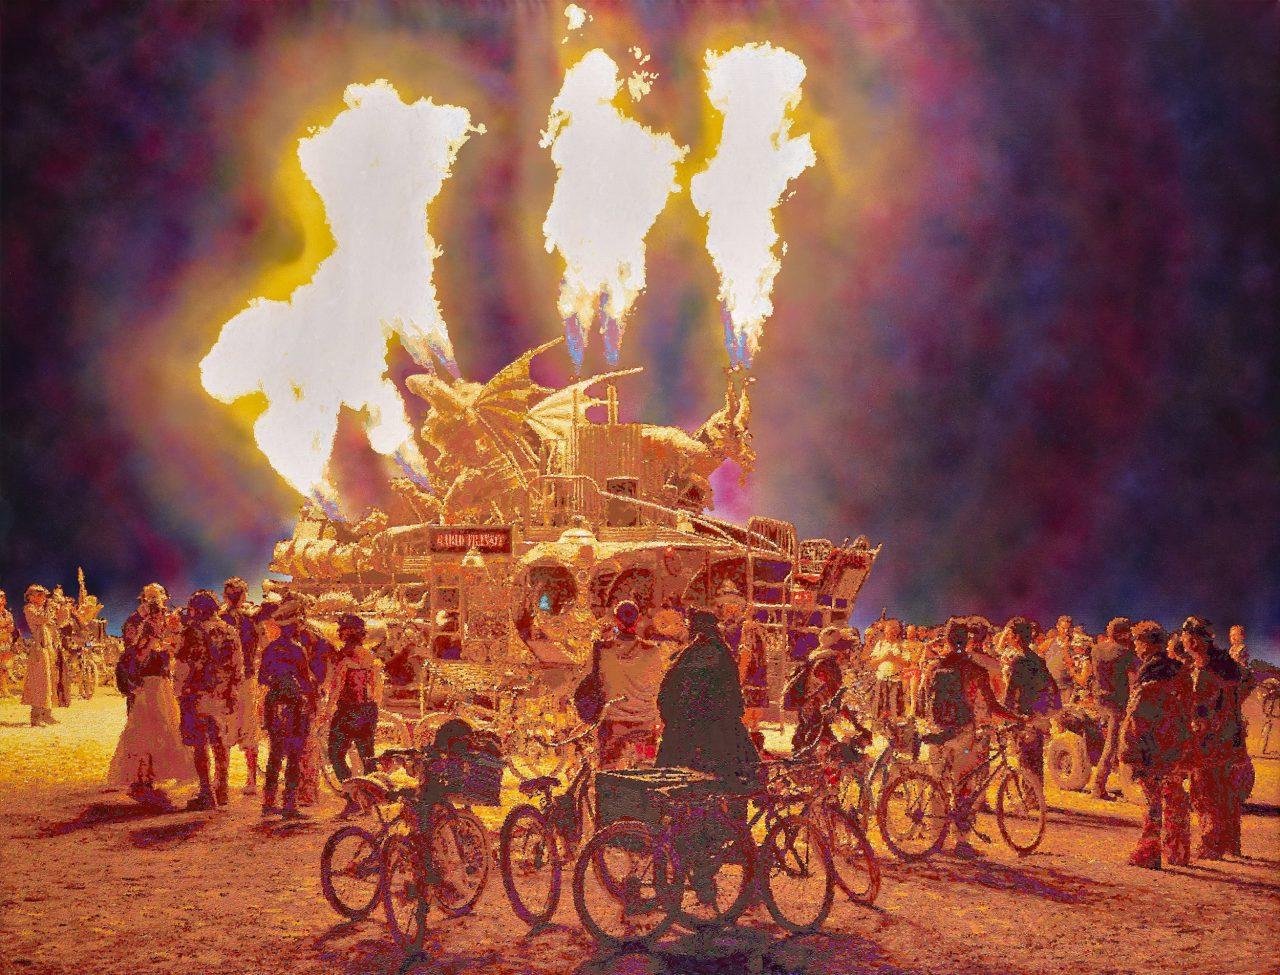 Burning Man - Electric Sky